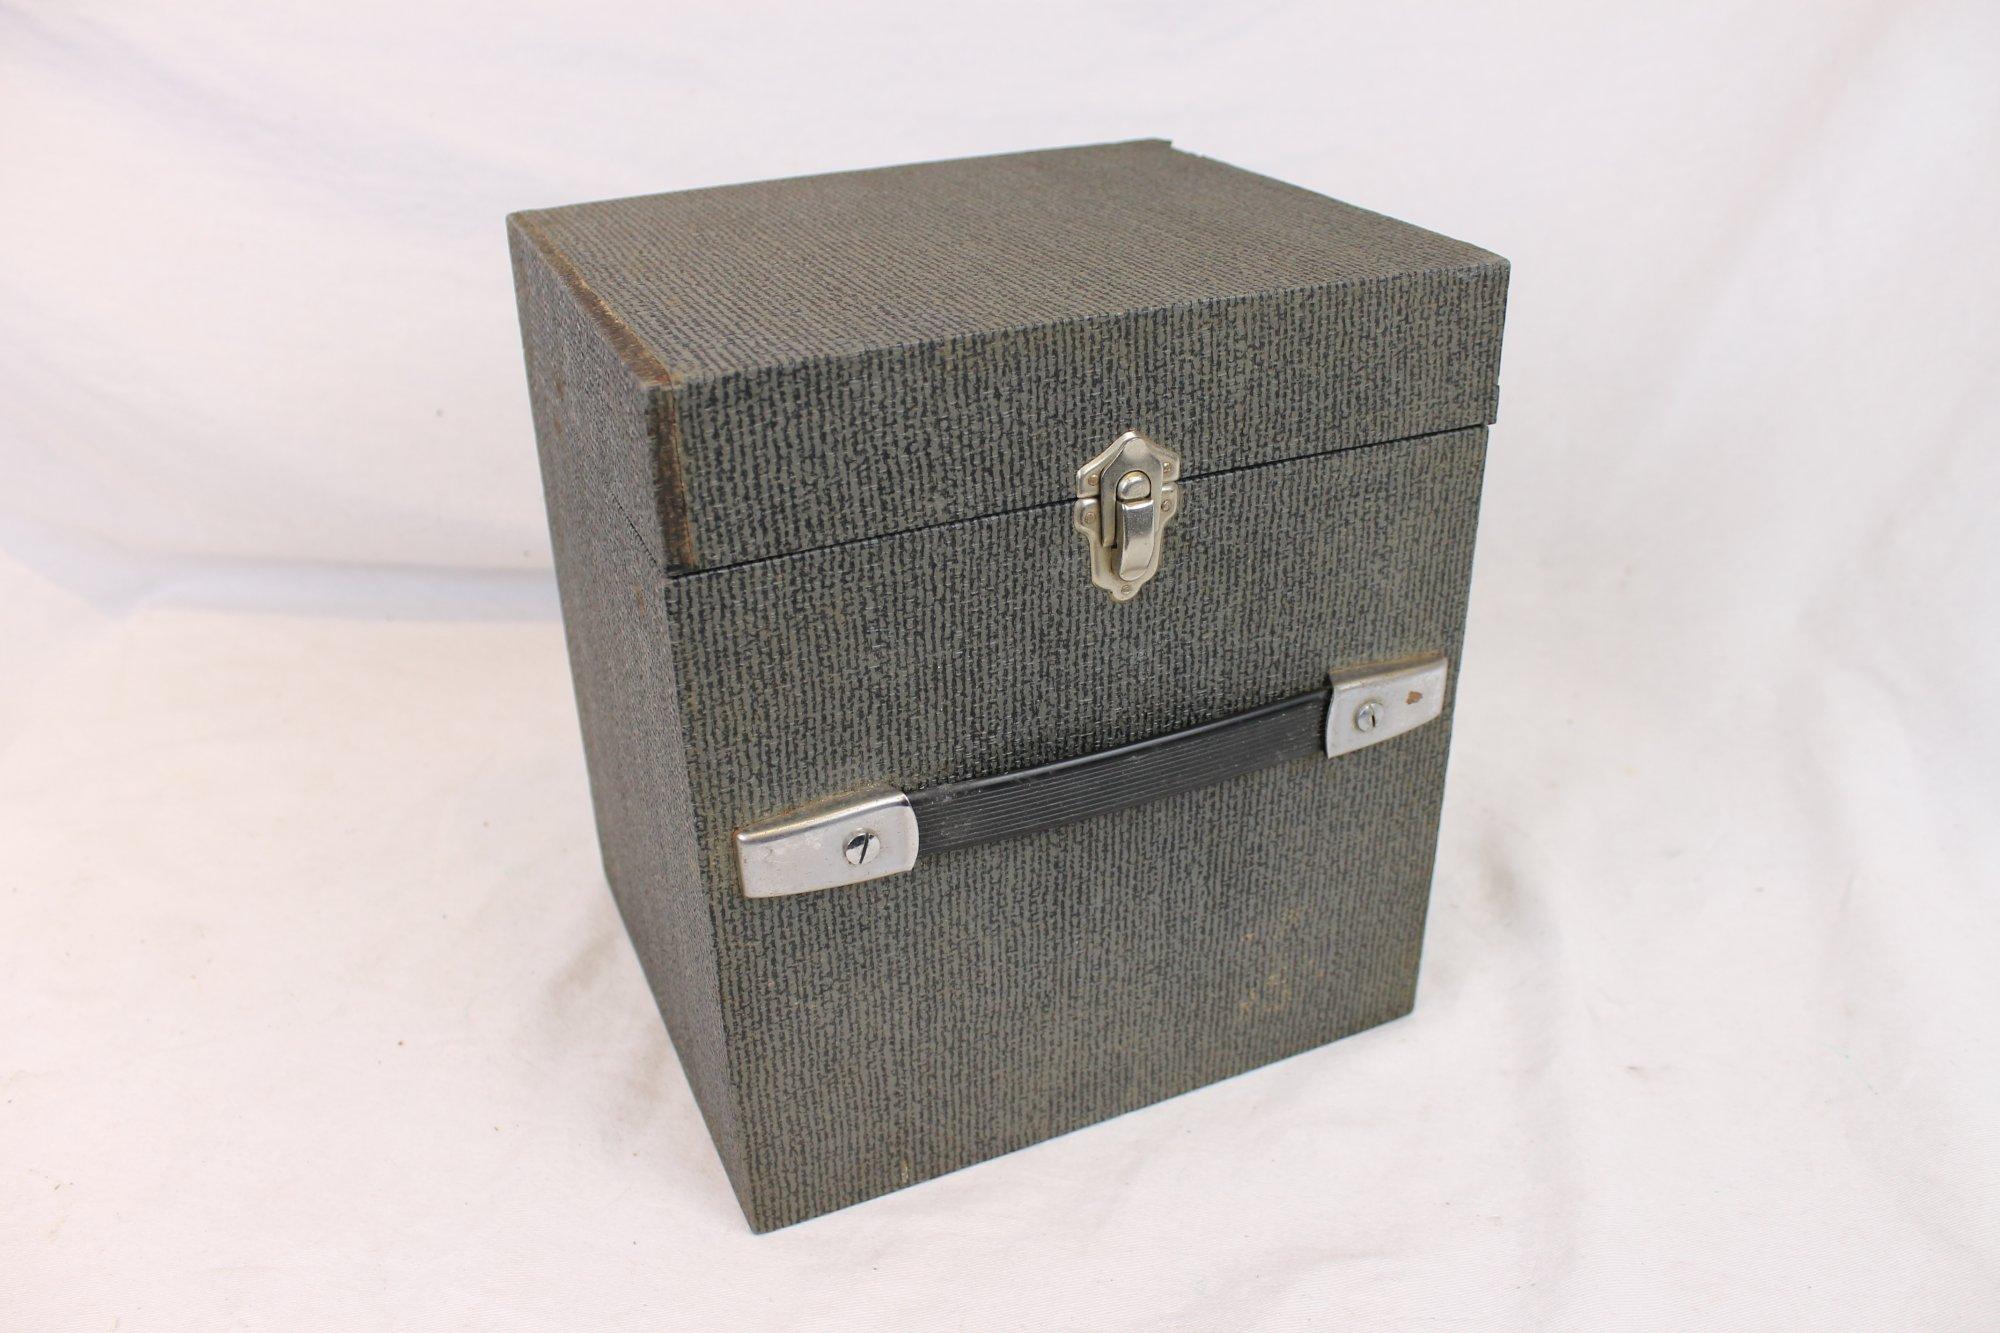 Gray Concertina Hard Case 8.75 x 7.5 x 6.5 (22.5cm x 19cm x 16.5cm)